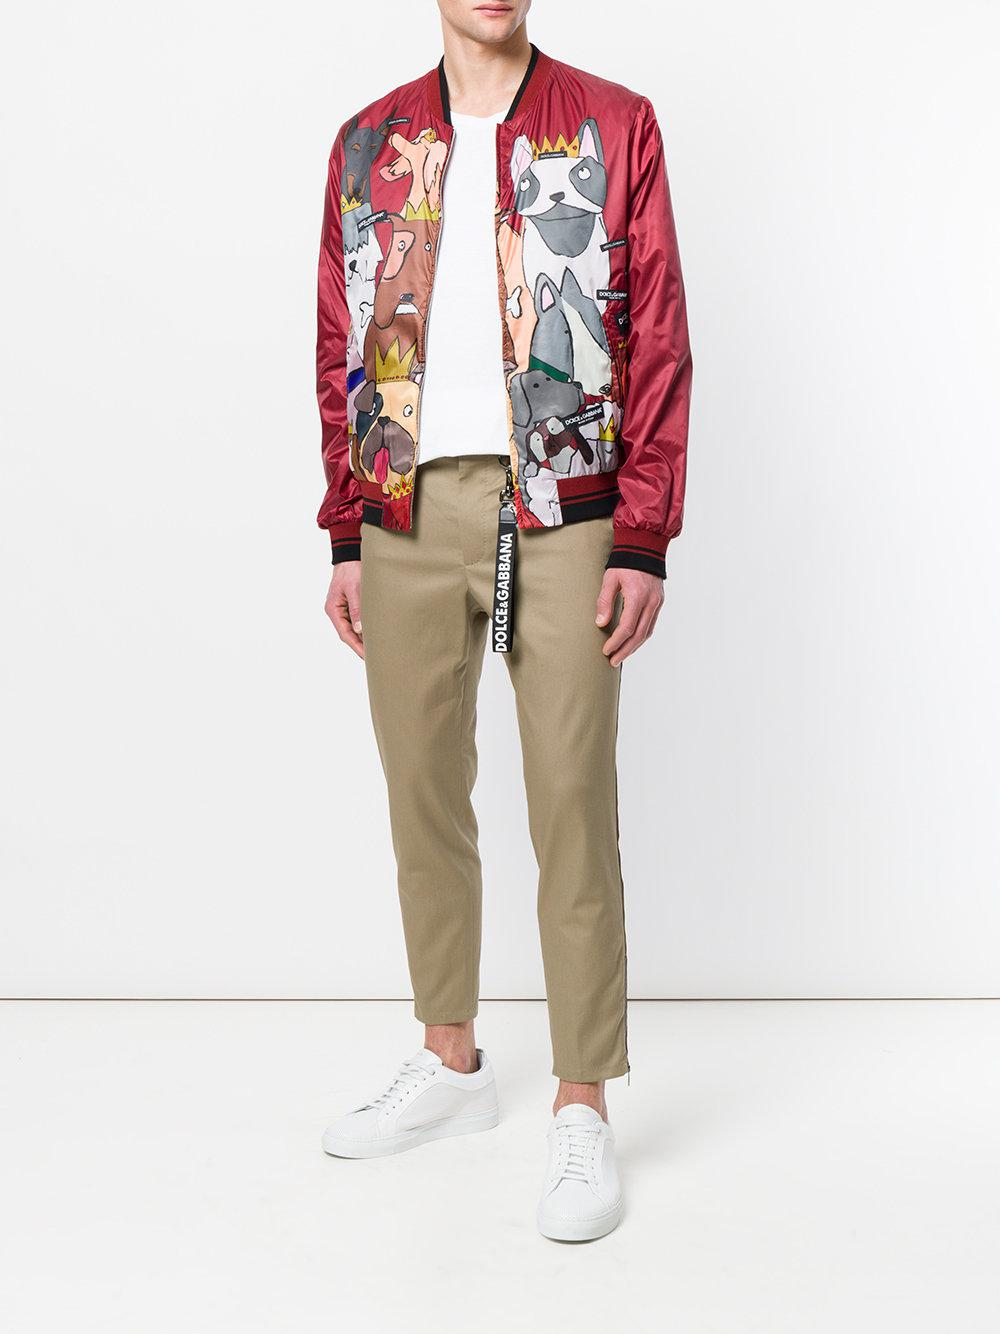 Dolce & Gabbana Cotton Dog Print Bomber Jacket in Red for Men